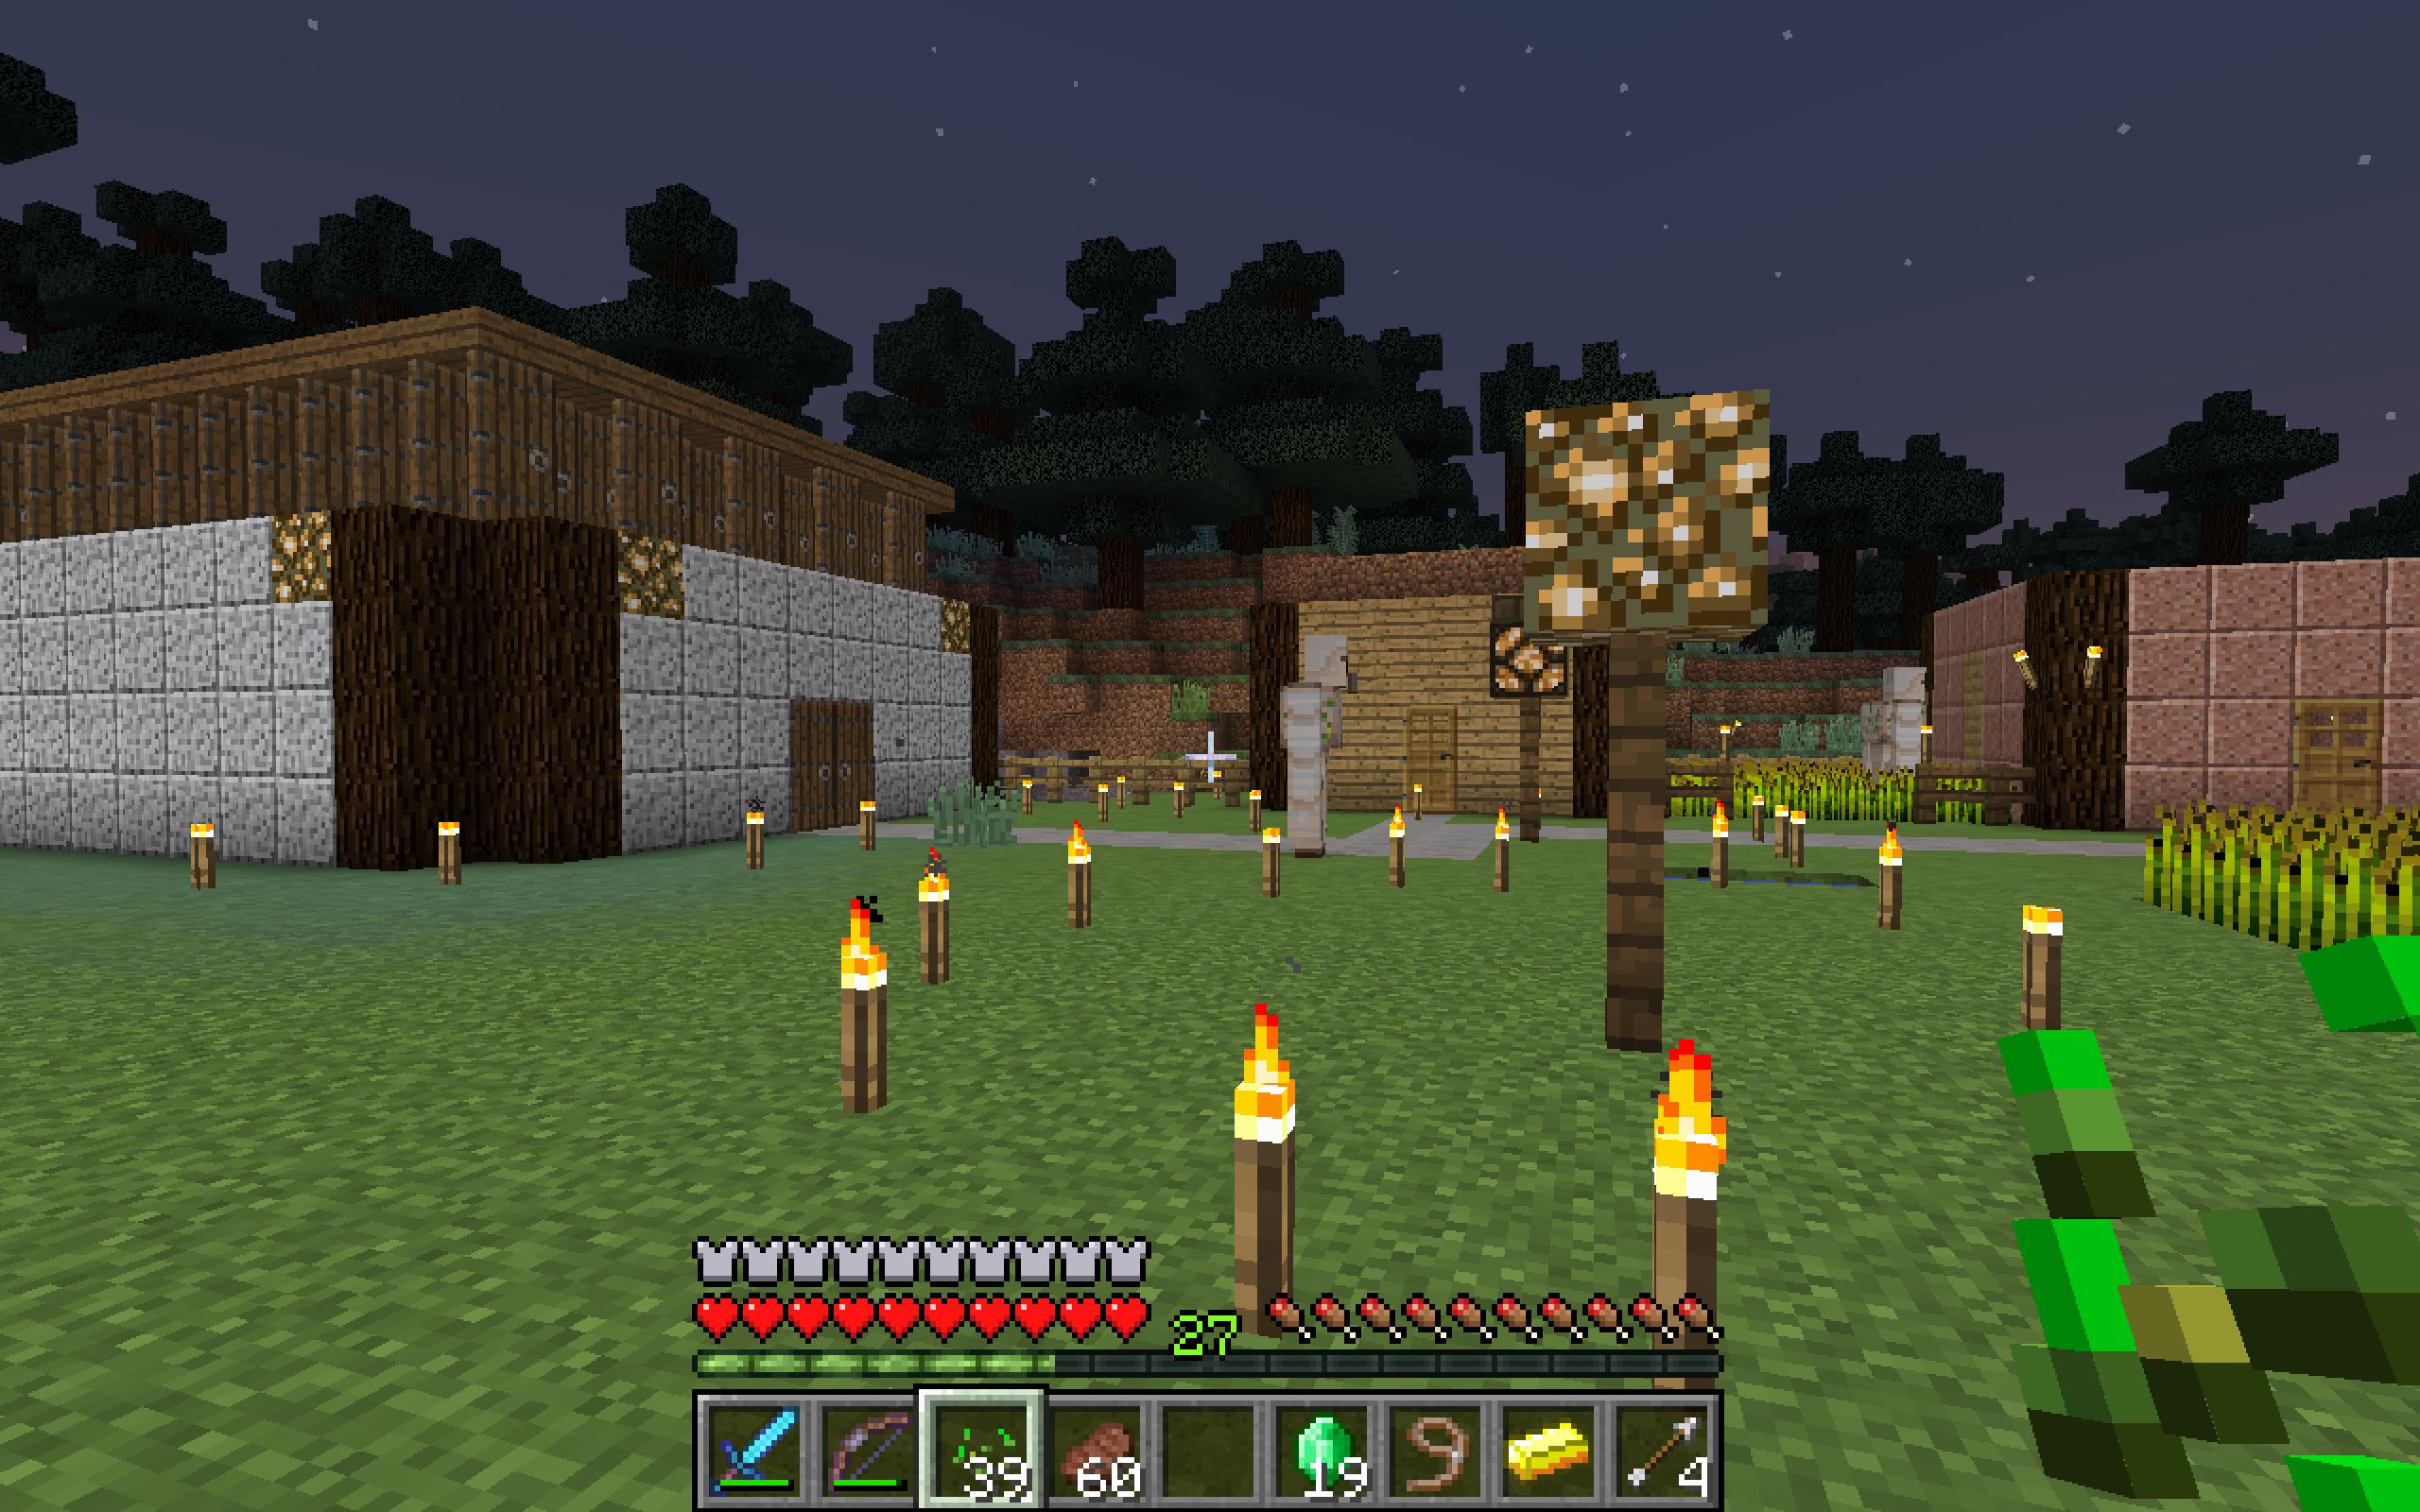 Breed Villagers Minecraft 7 10 Hd – Fondos de Pantalla